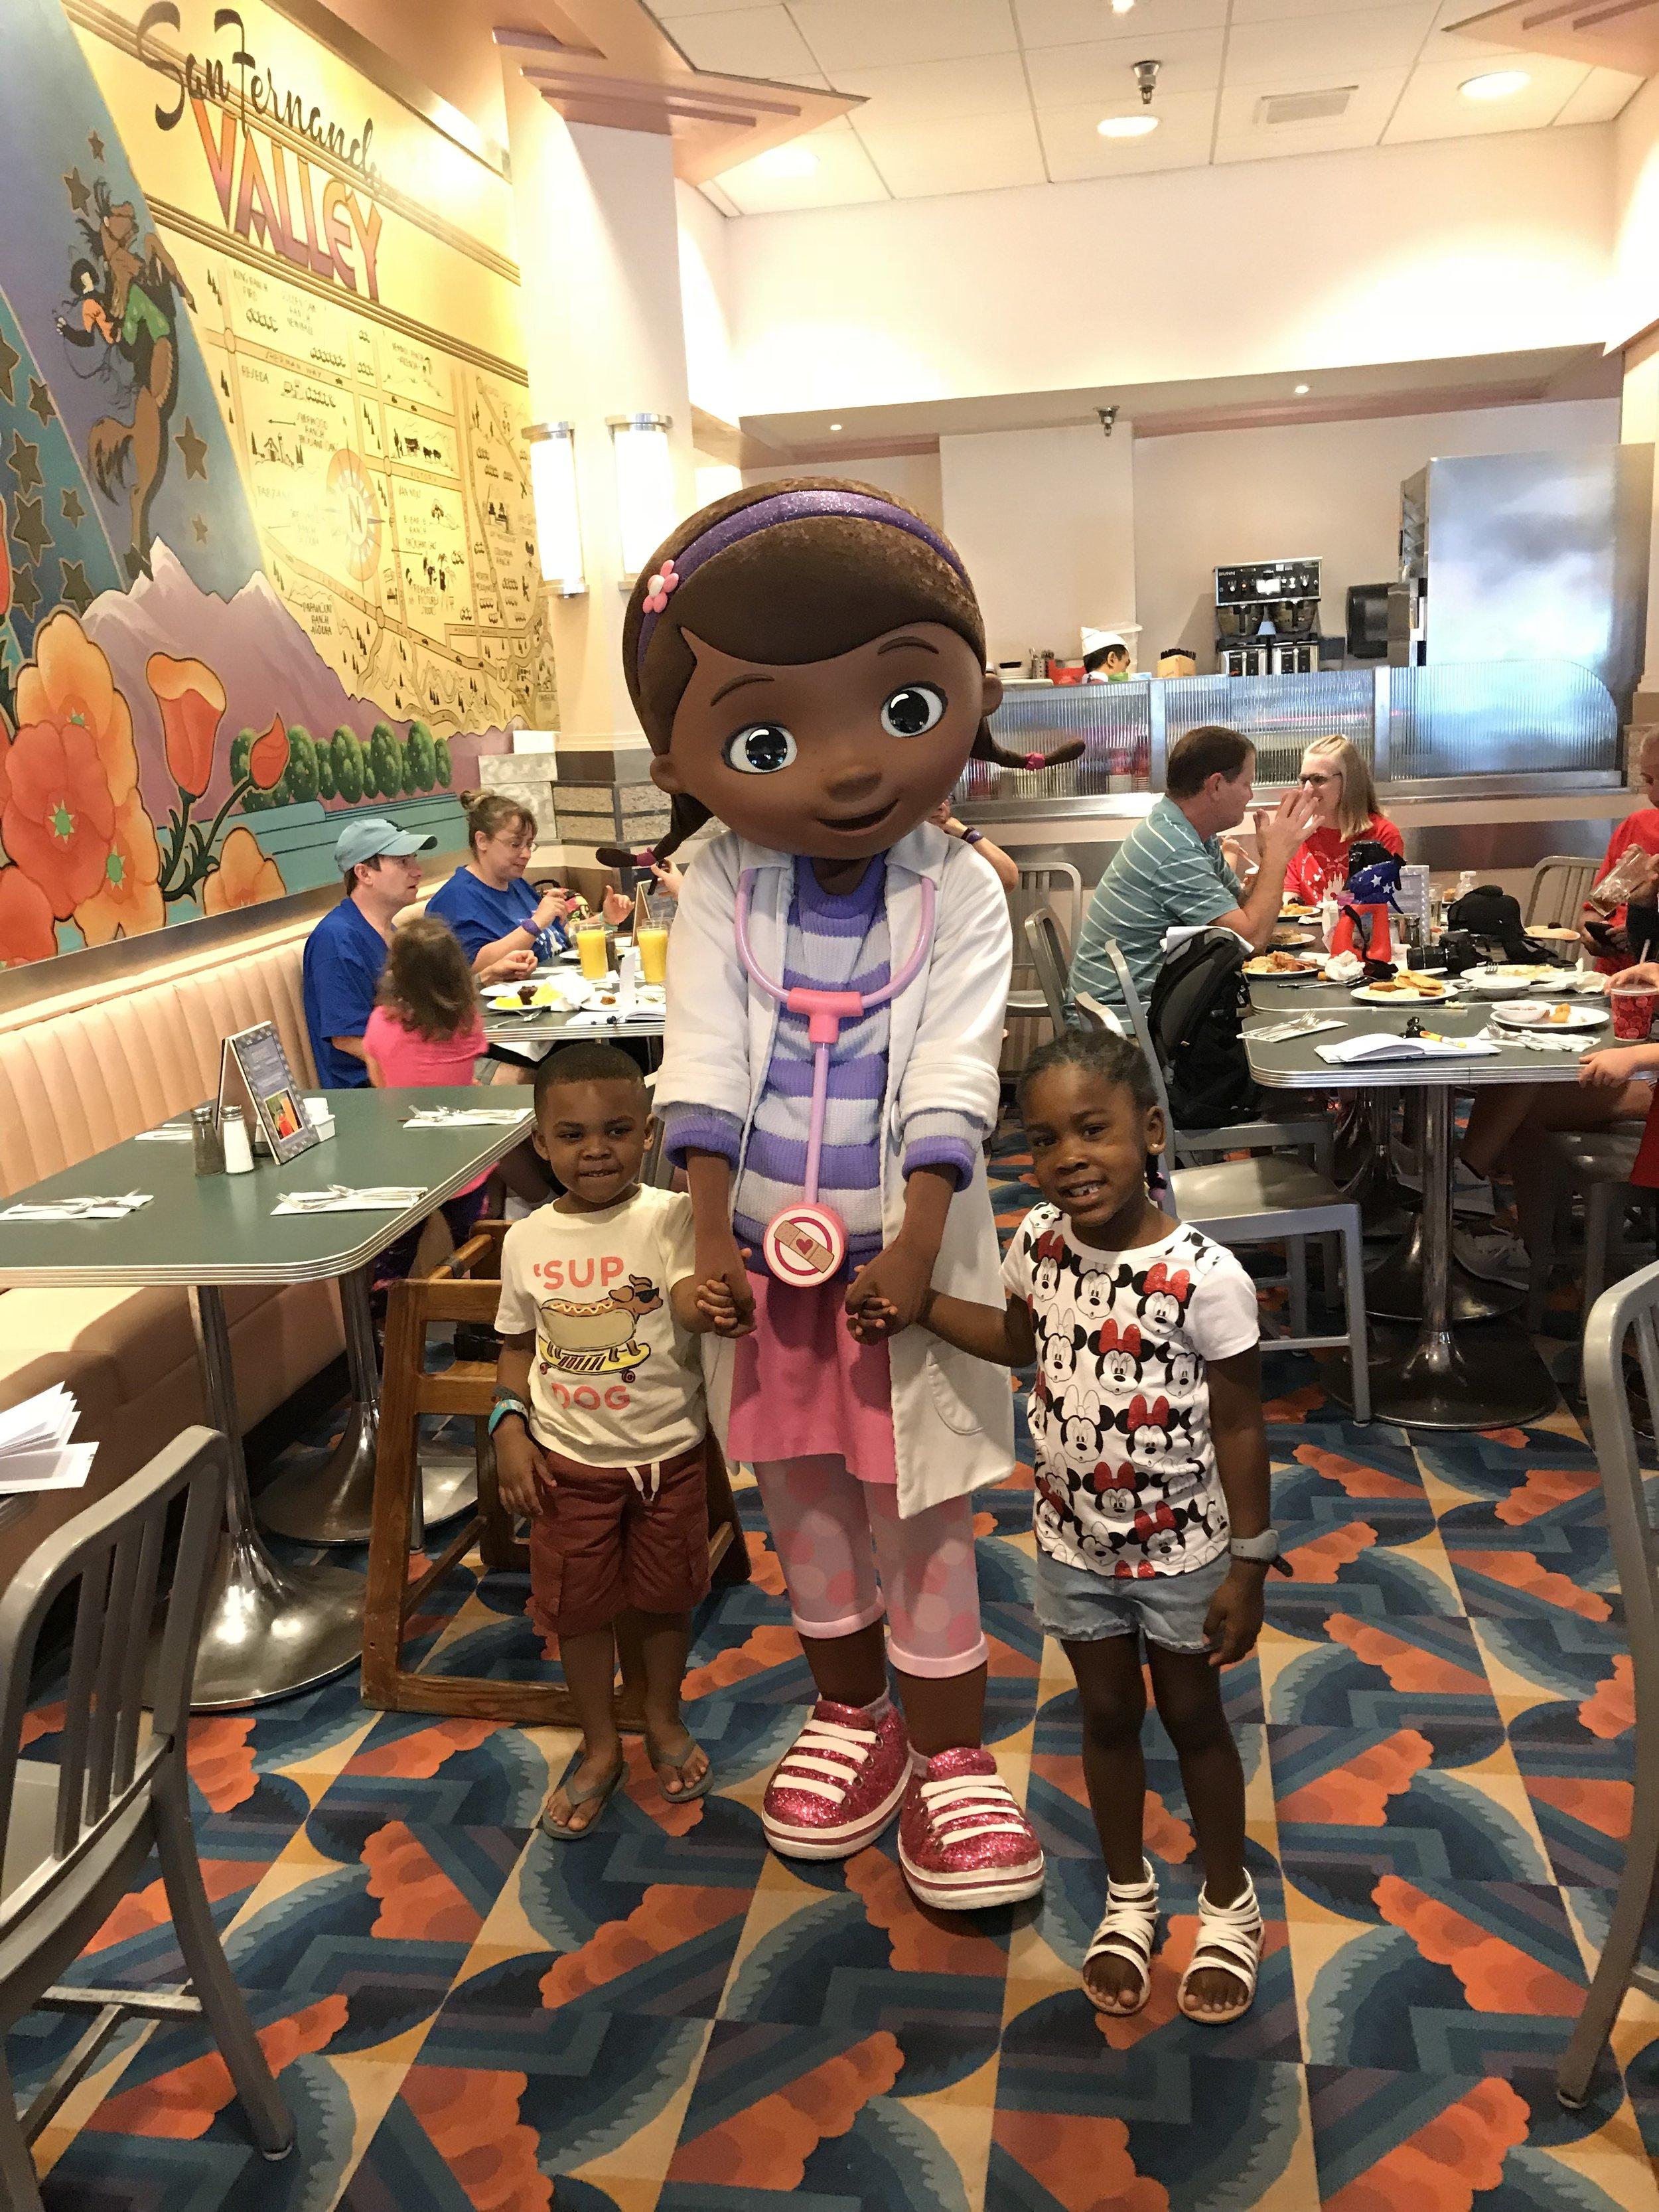 Disney-with-toddlers-magic-kingdom-7.jpg